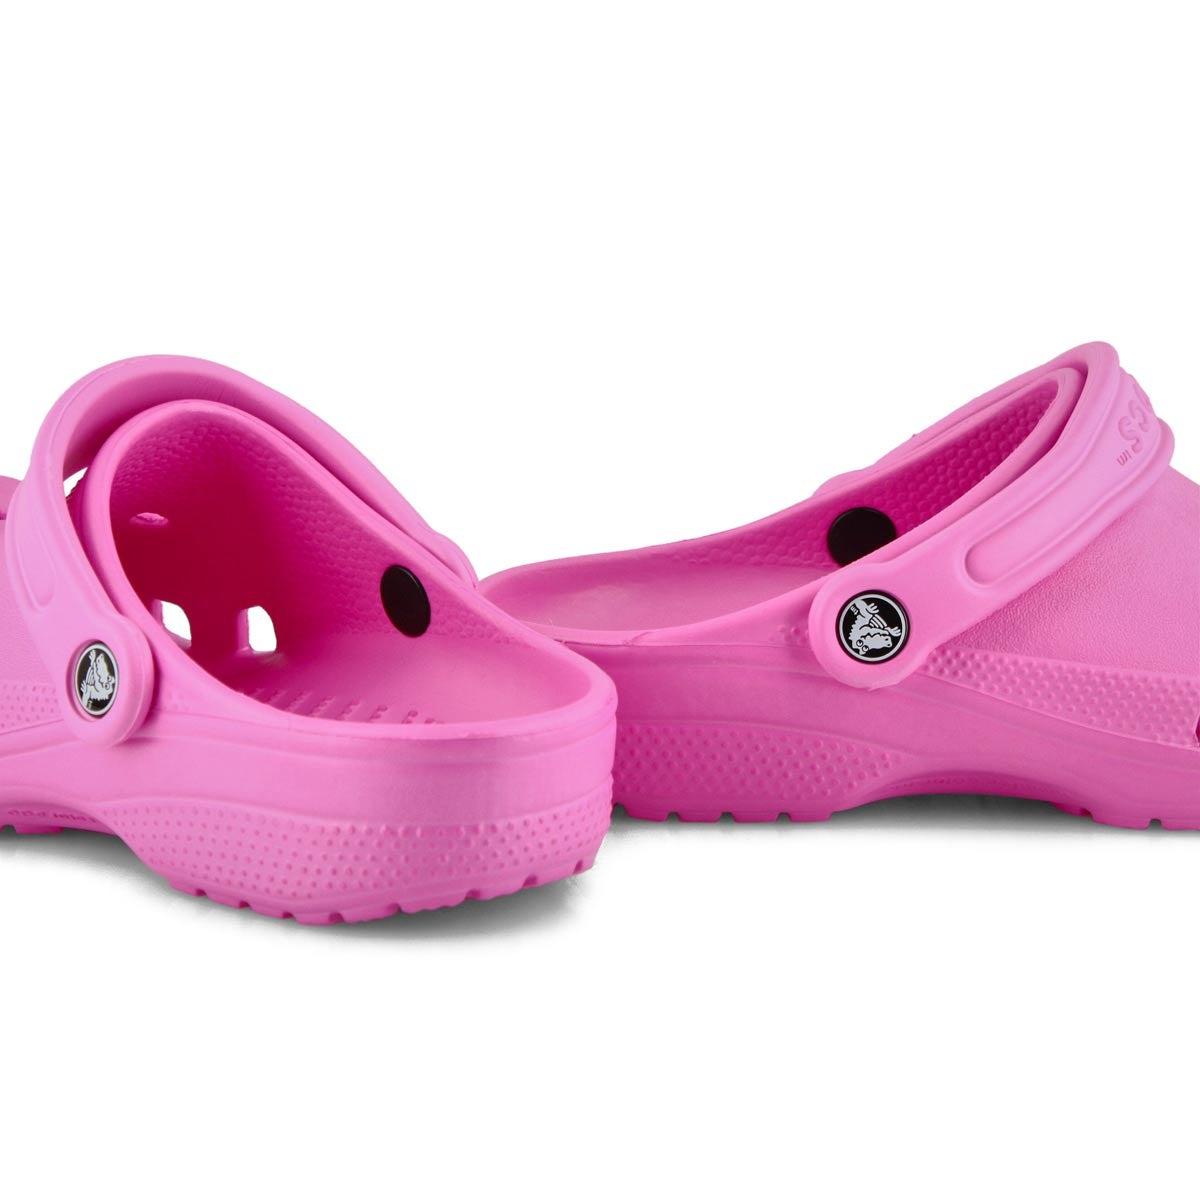 Women's Classic EVA Comfort Clog - Electric Pink